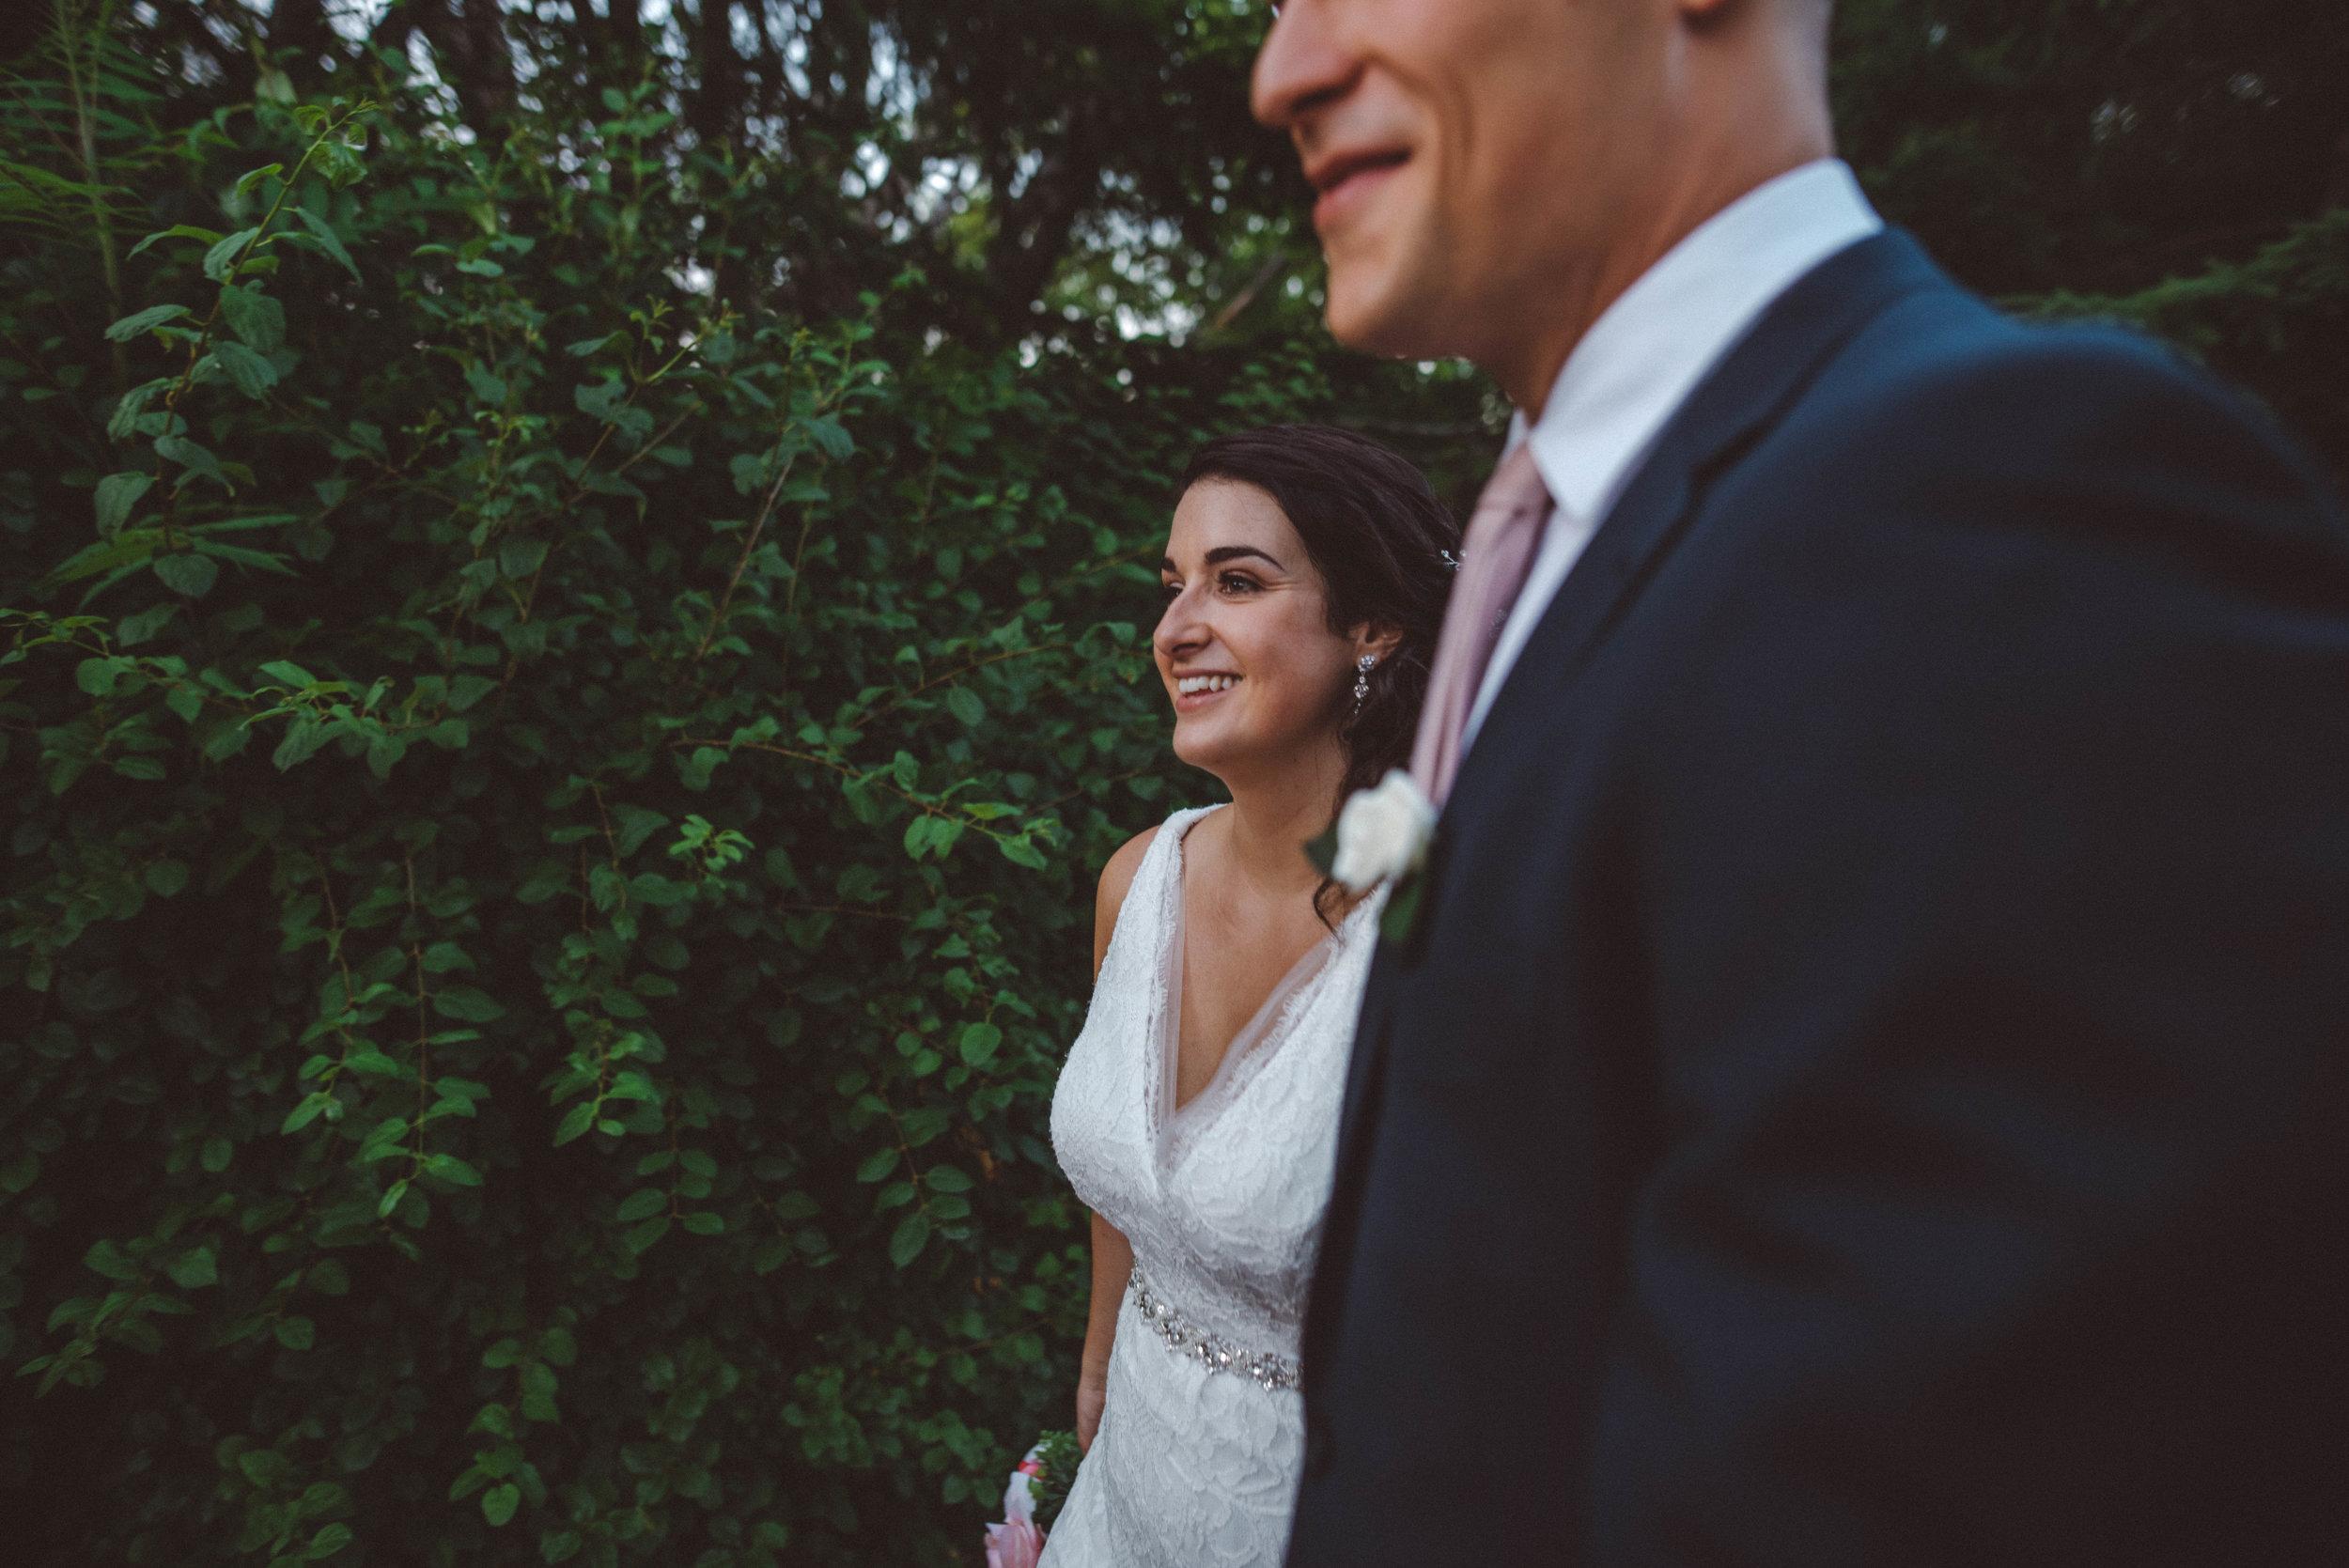 photographe_mariage_gatineau_hull_outaouais_photographer_ottawa_wedding_hilton-5.jpg